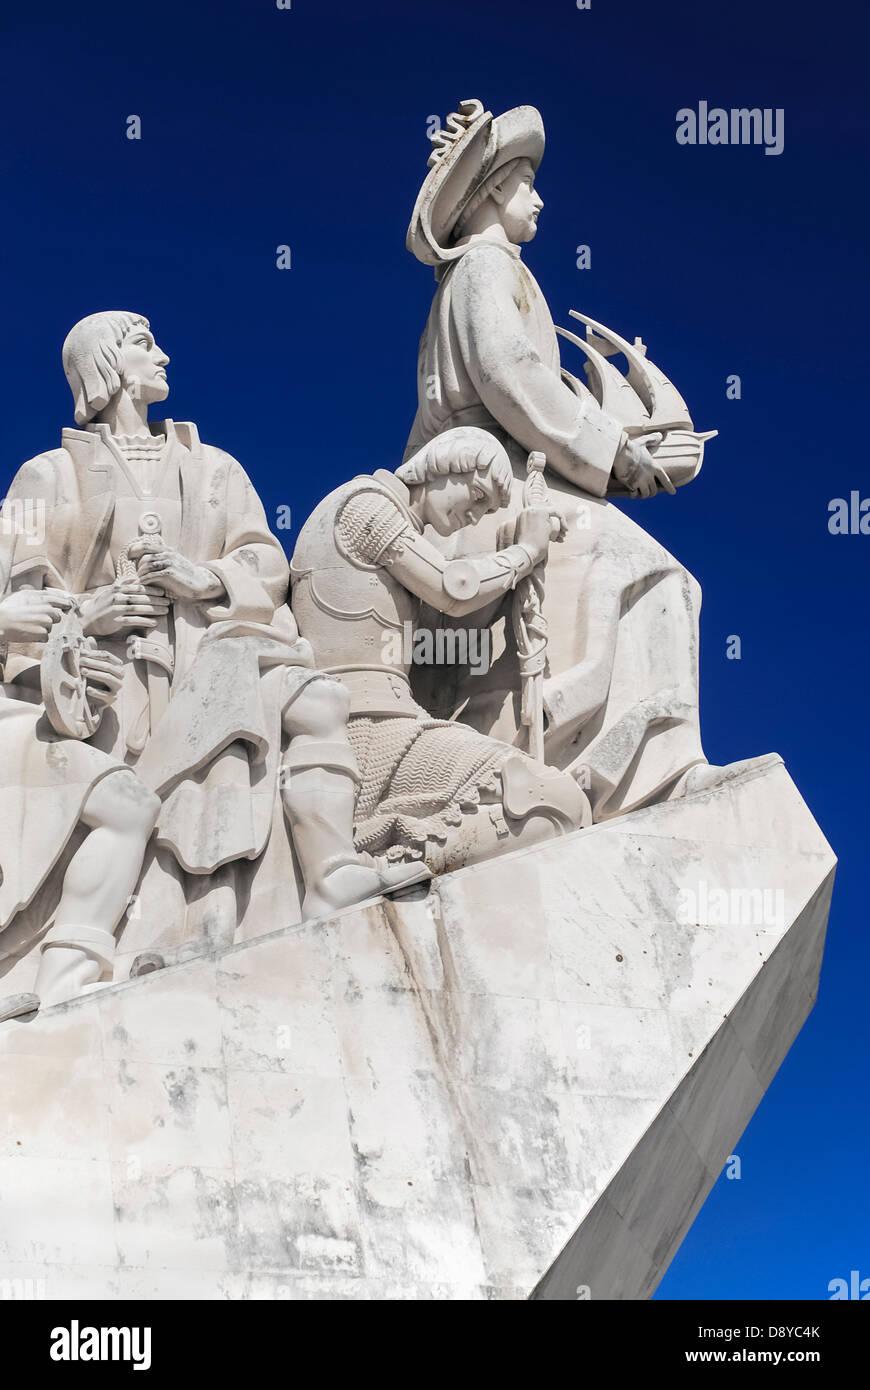 Portugal, Estremadura, Lisbon, Padrao dos Descobrimentos Carving of Prince Henry the Navigator leading the Discoveries - Stock Image